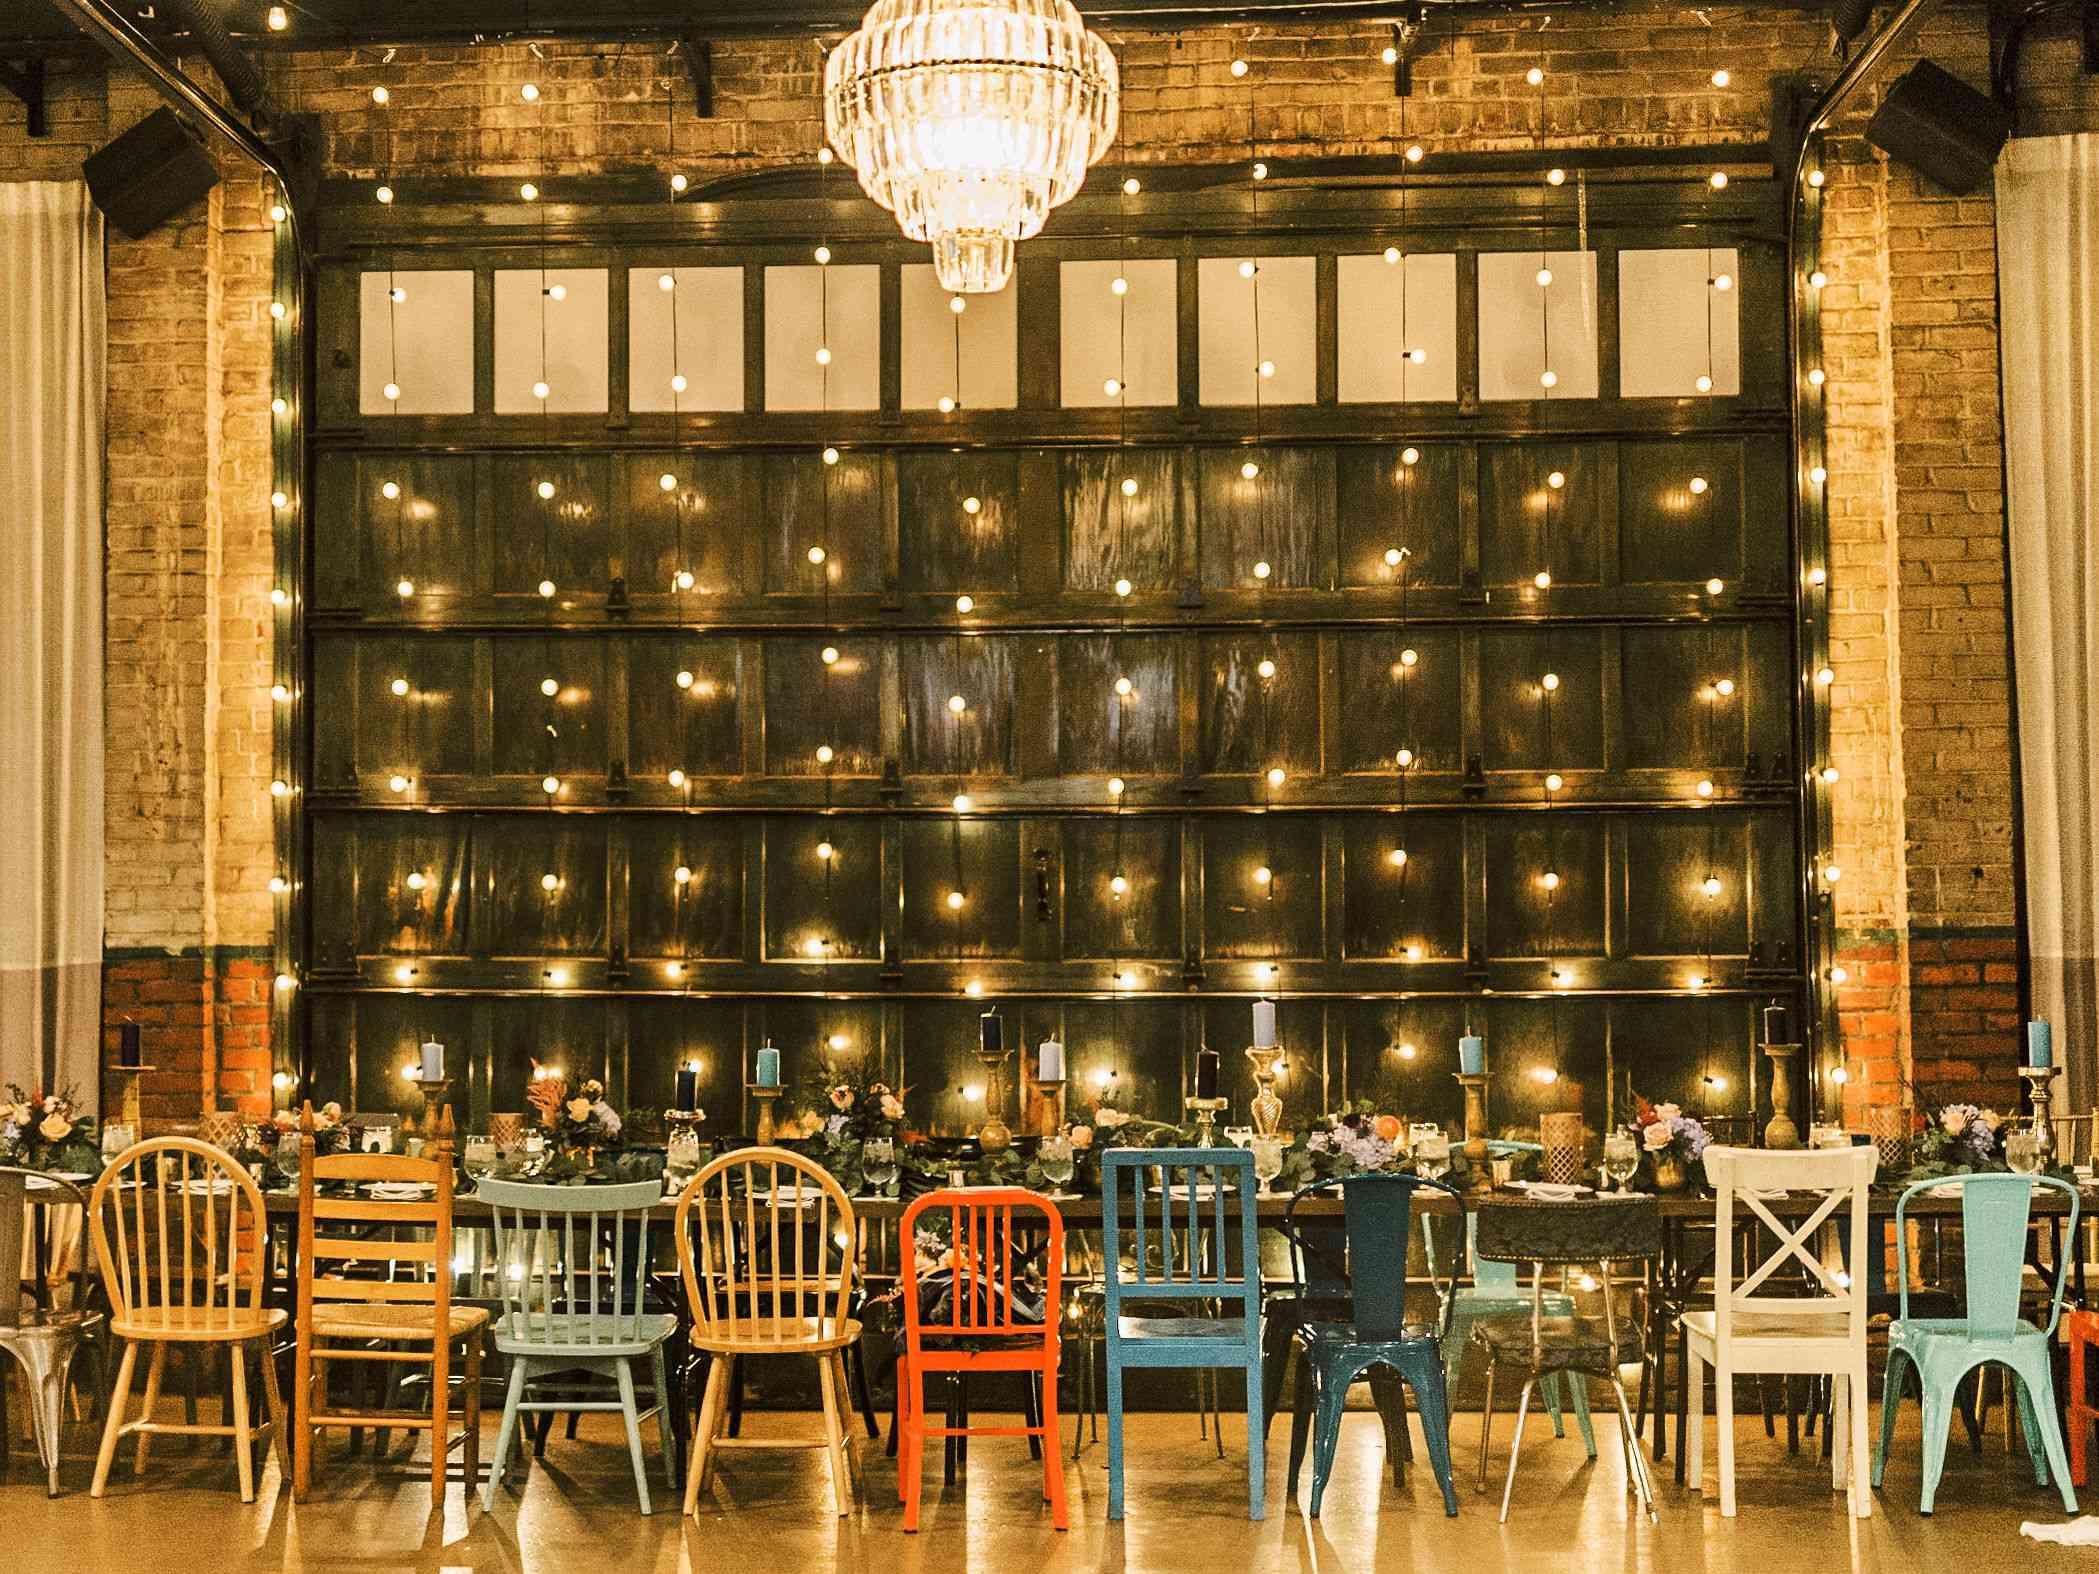 whimsical savannah wedding, mismatched chairs reception decor